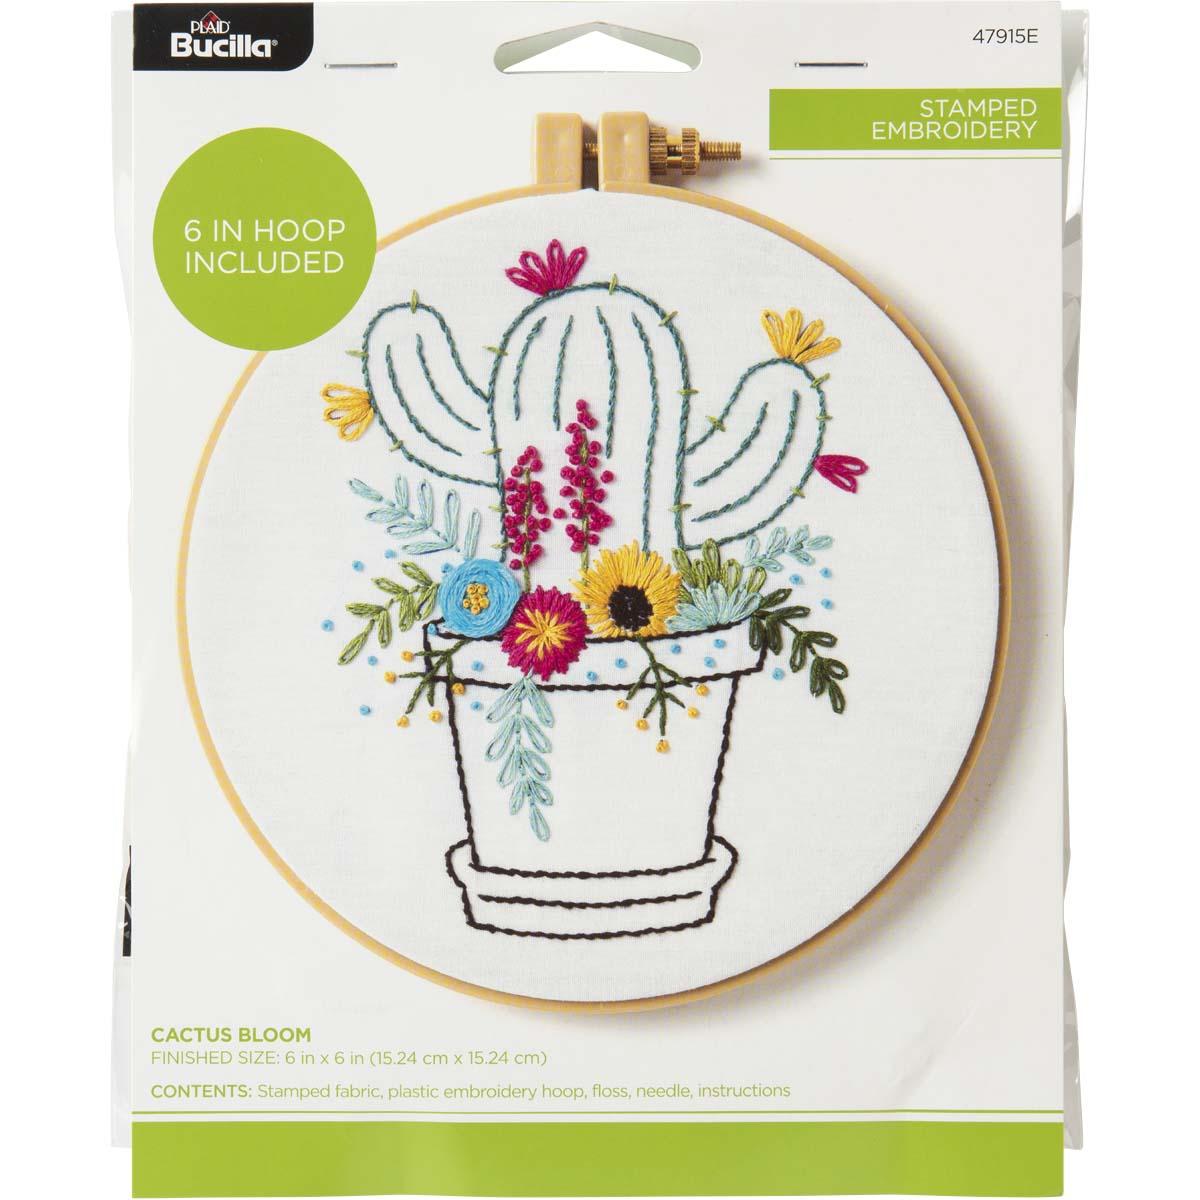 Bucilla ® Stamped Embroidery - Cactus Bloom - 47915E